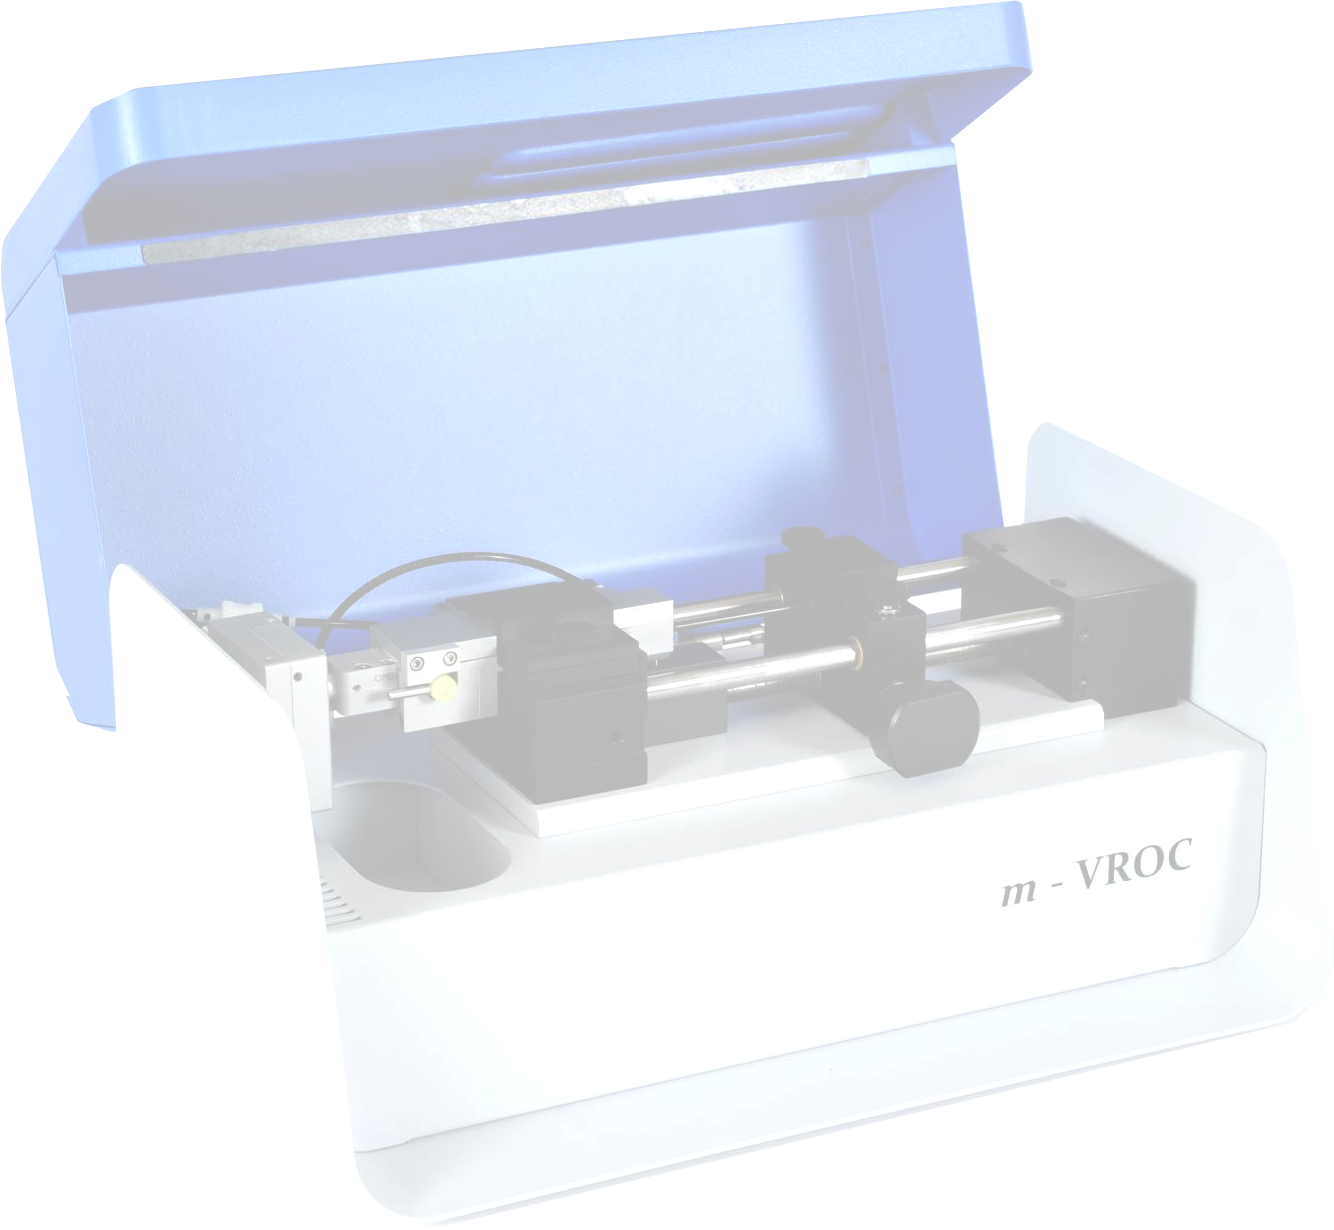 Small-sample viscometer, m-VROC